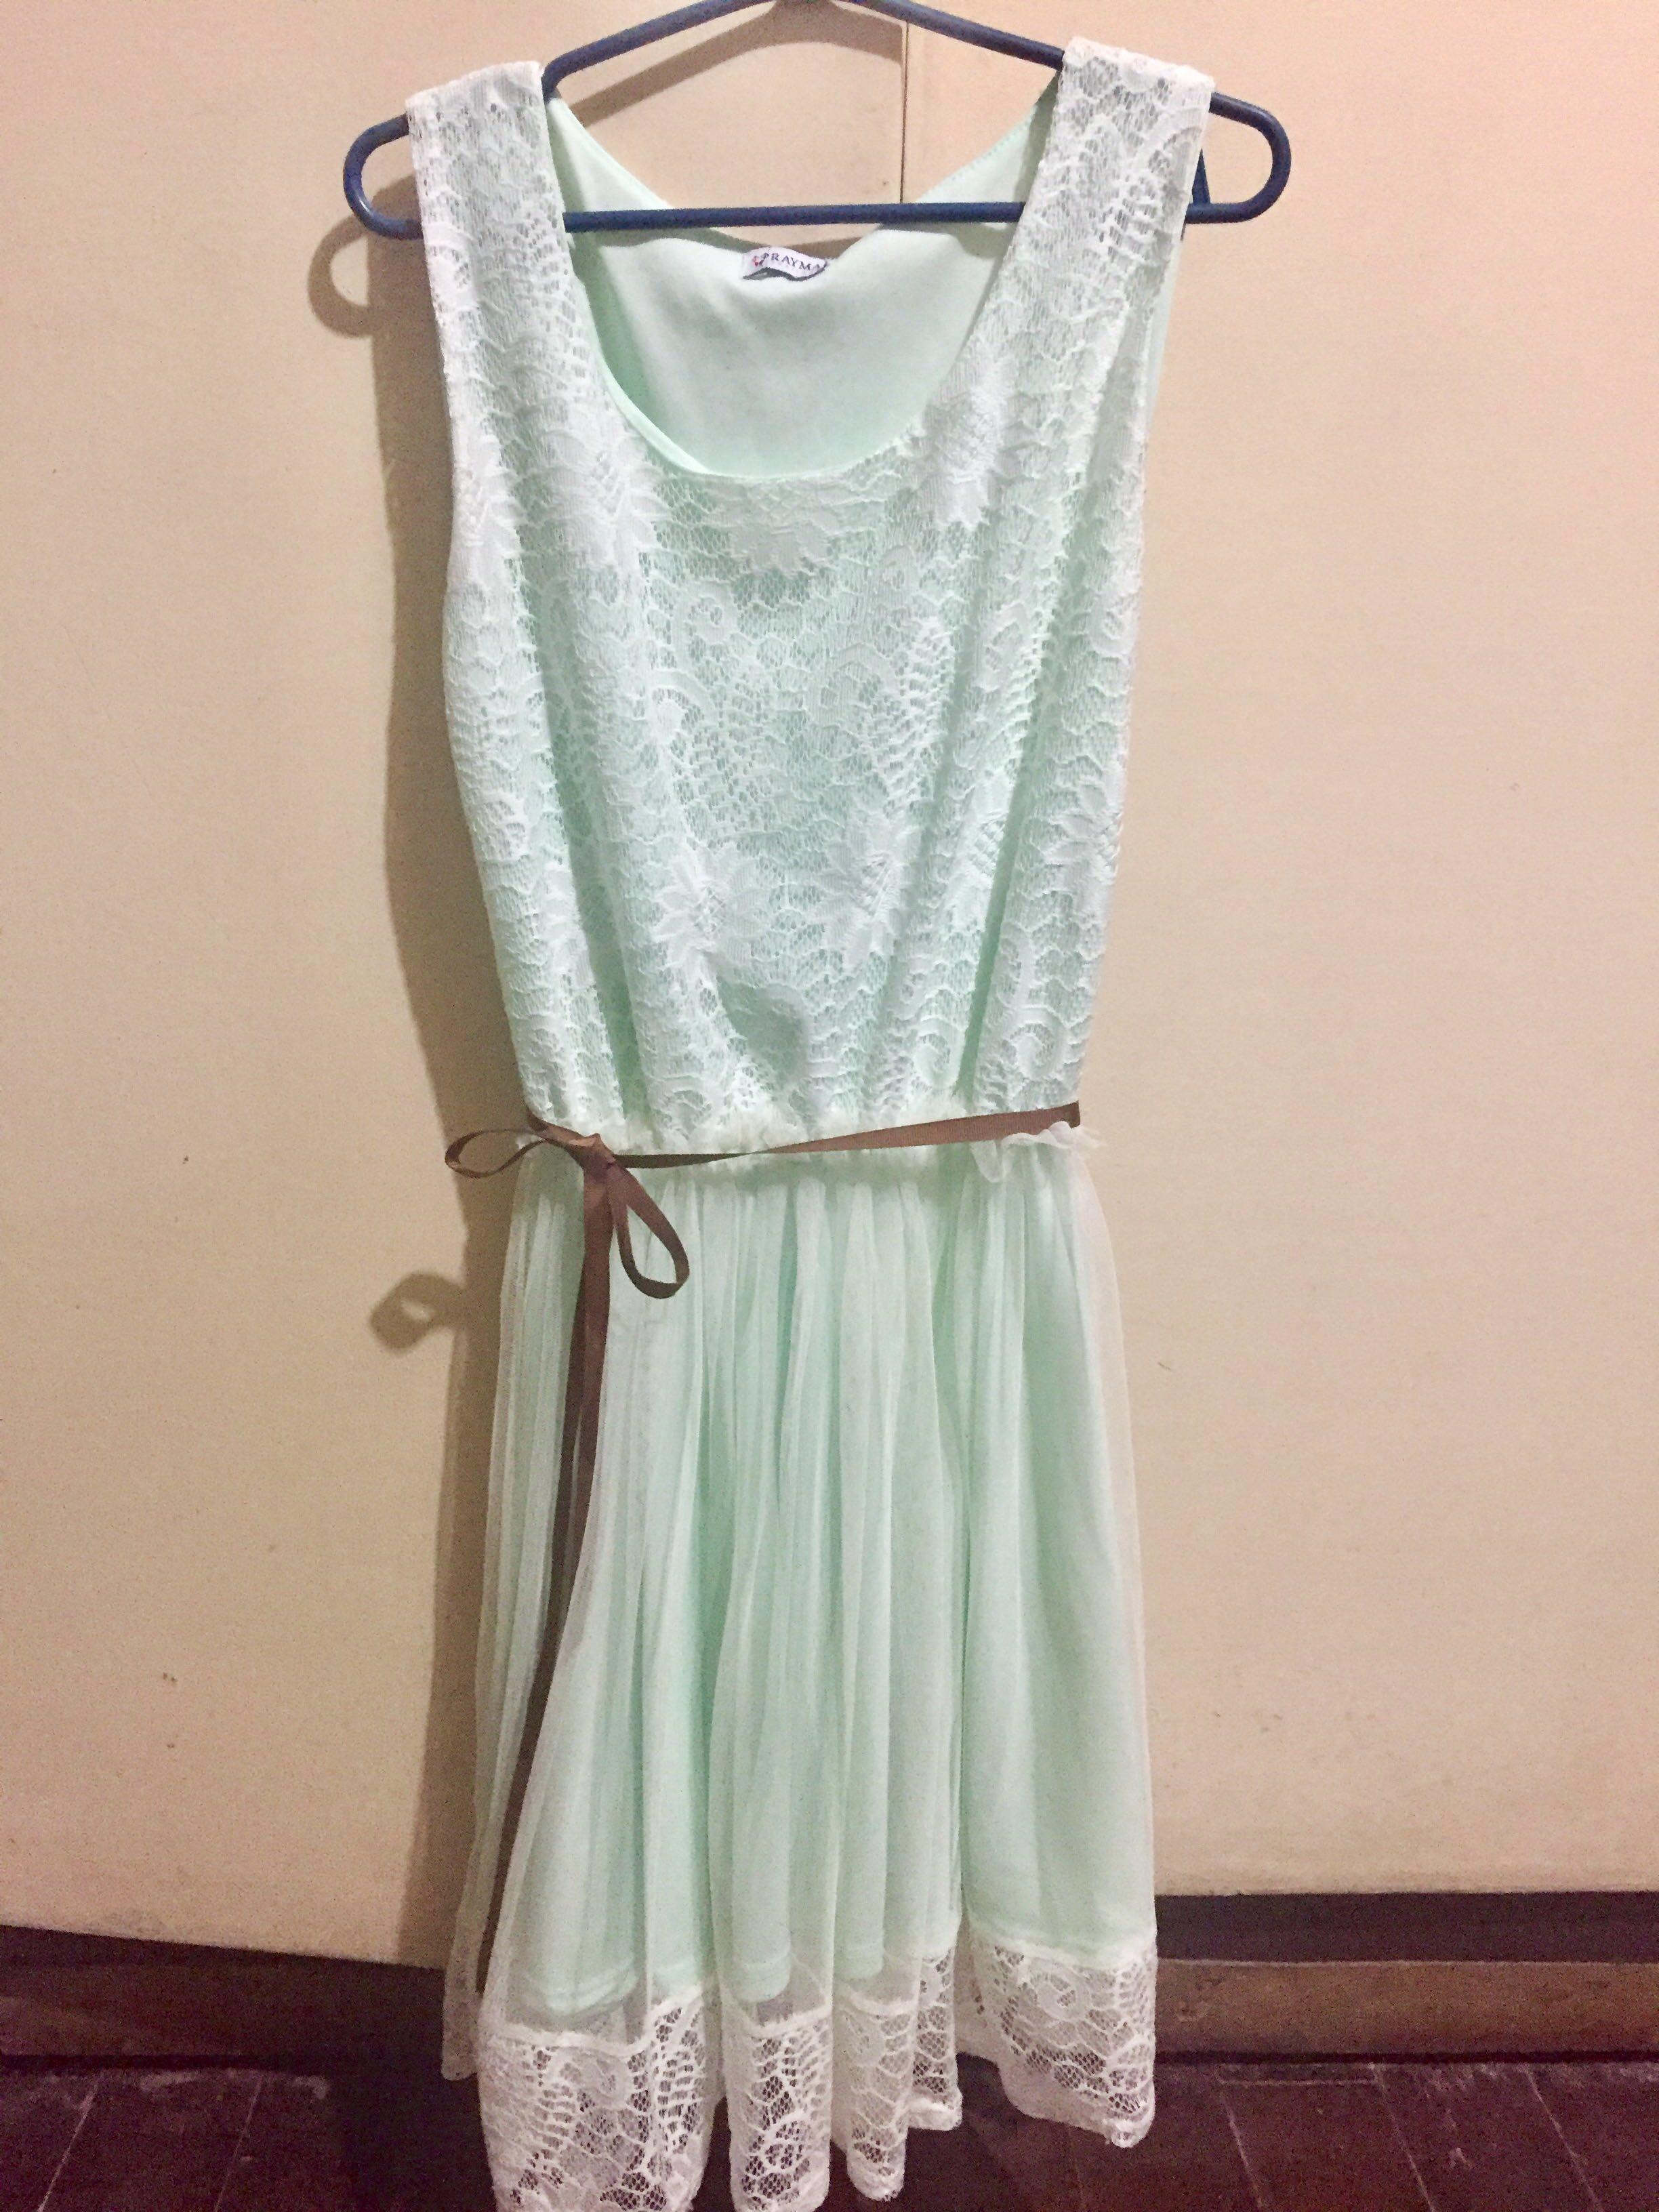 daf008be70a7 Mint Green Lace Dress